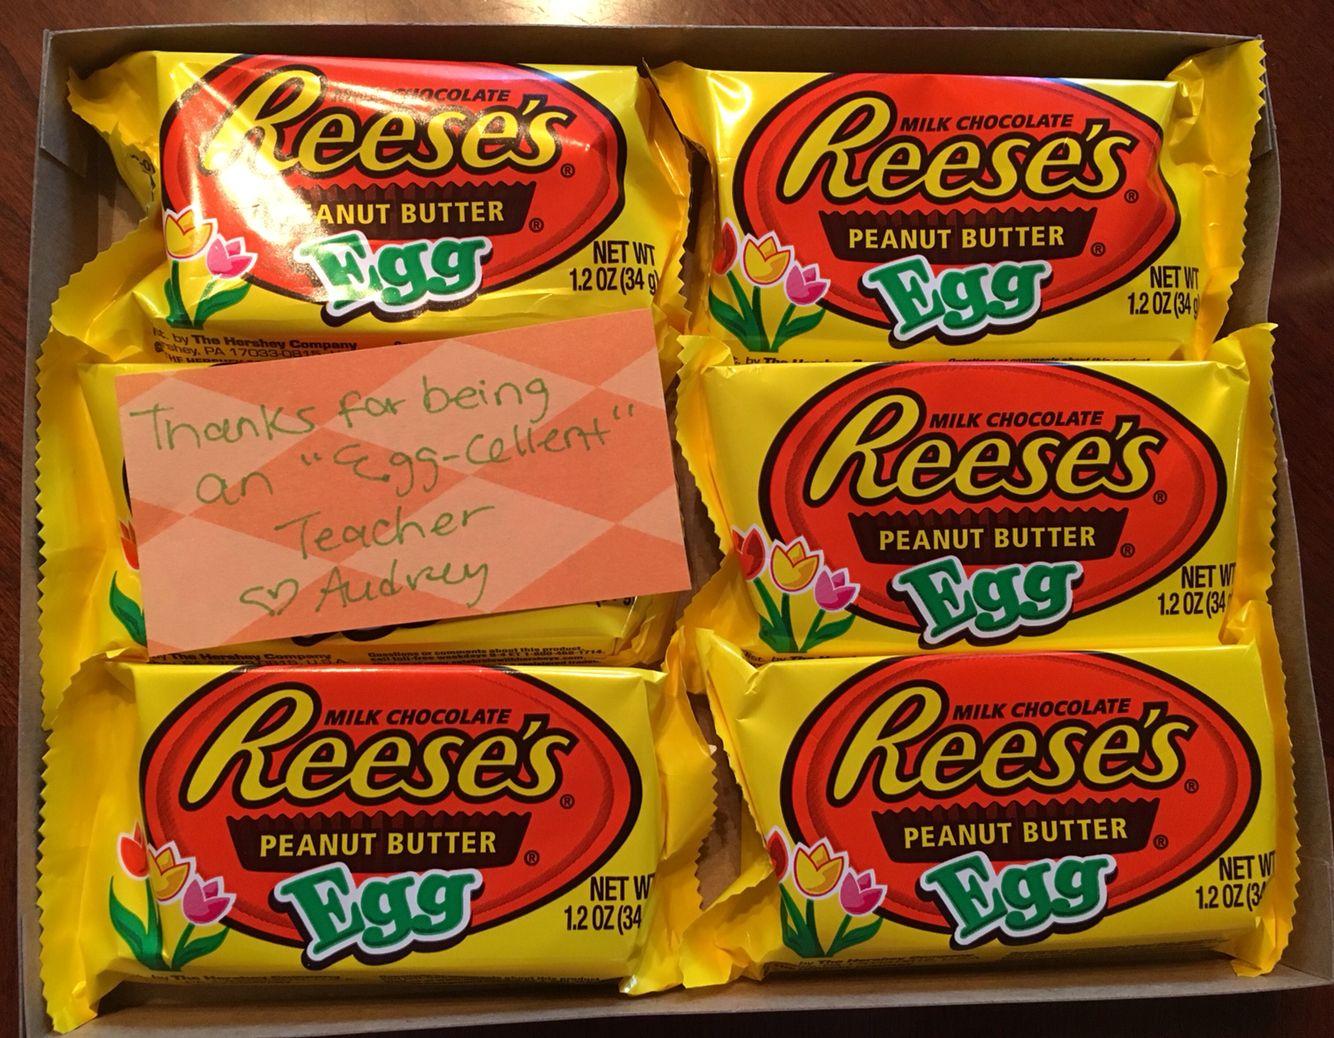 Thanks for being an eggcellent teacher easter gift idea thanks for being an eggcellent teacher easter gift idea fbdinnerclub negle Gallery